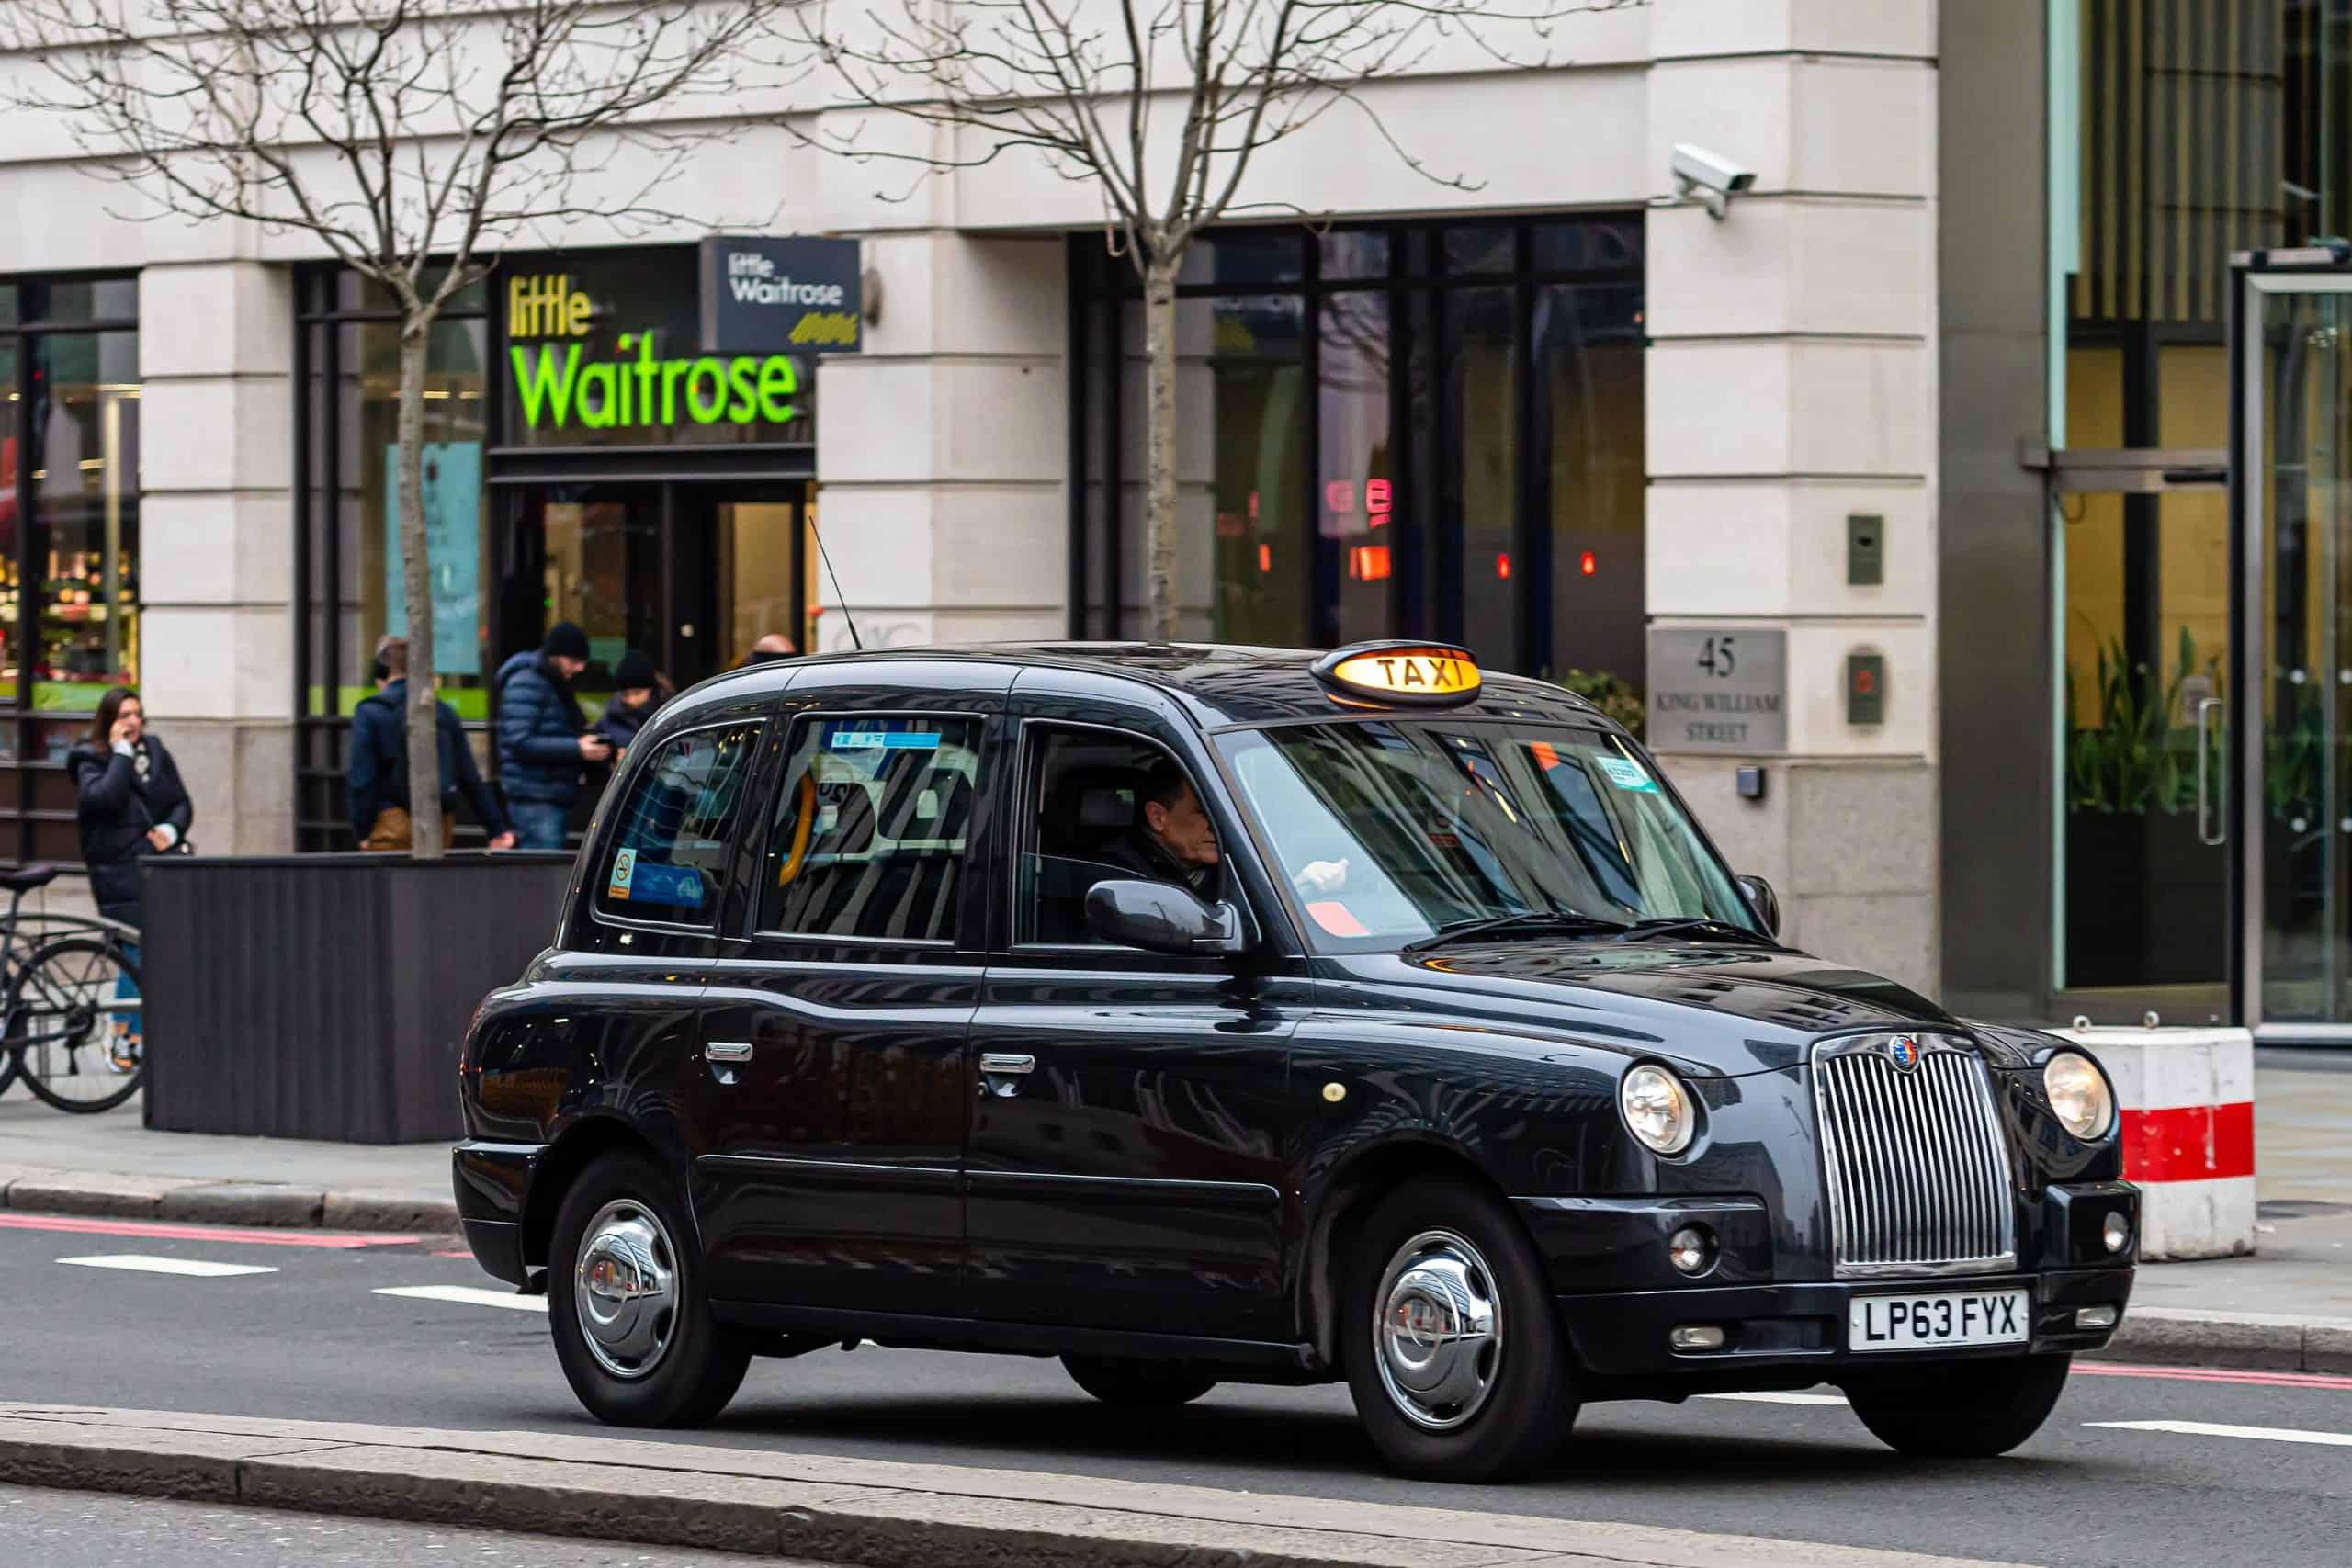 Black cab driving